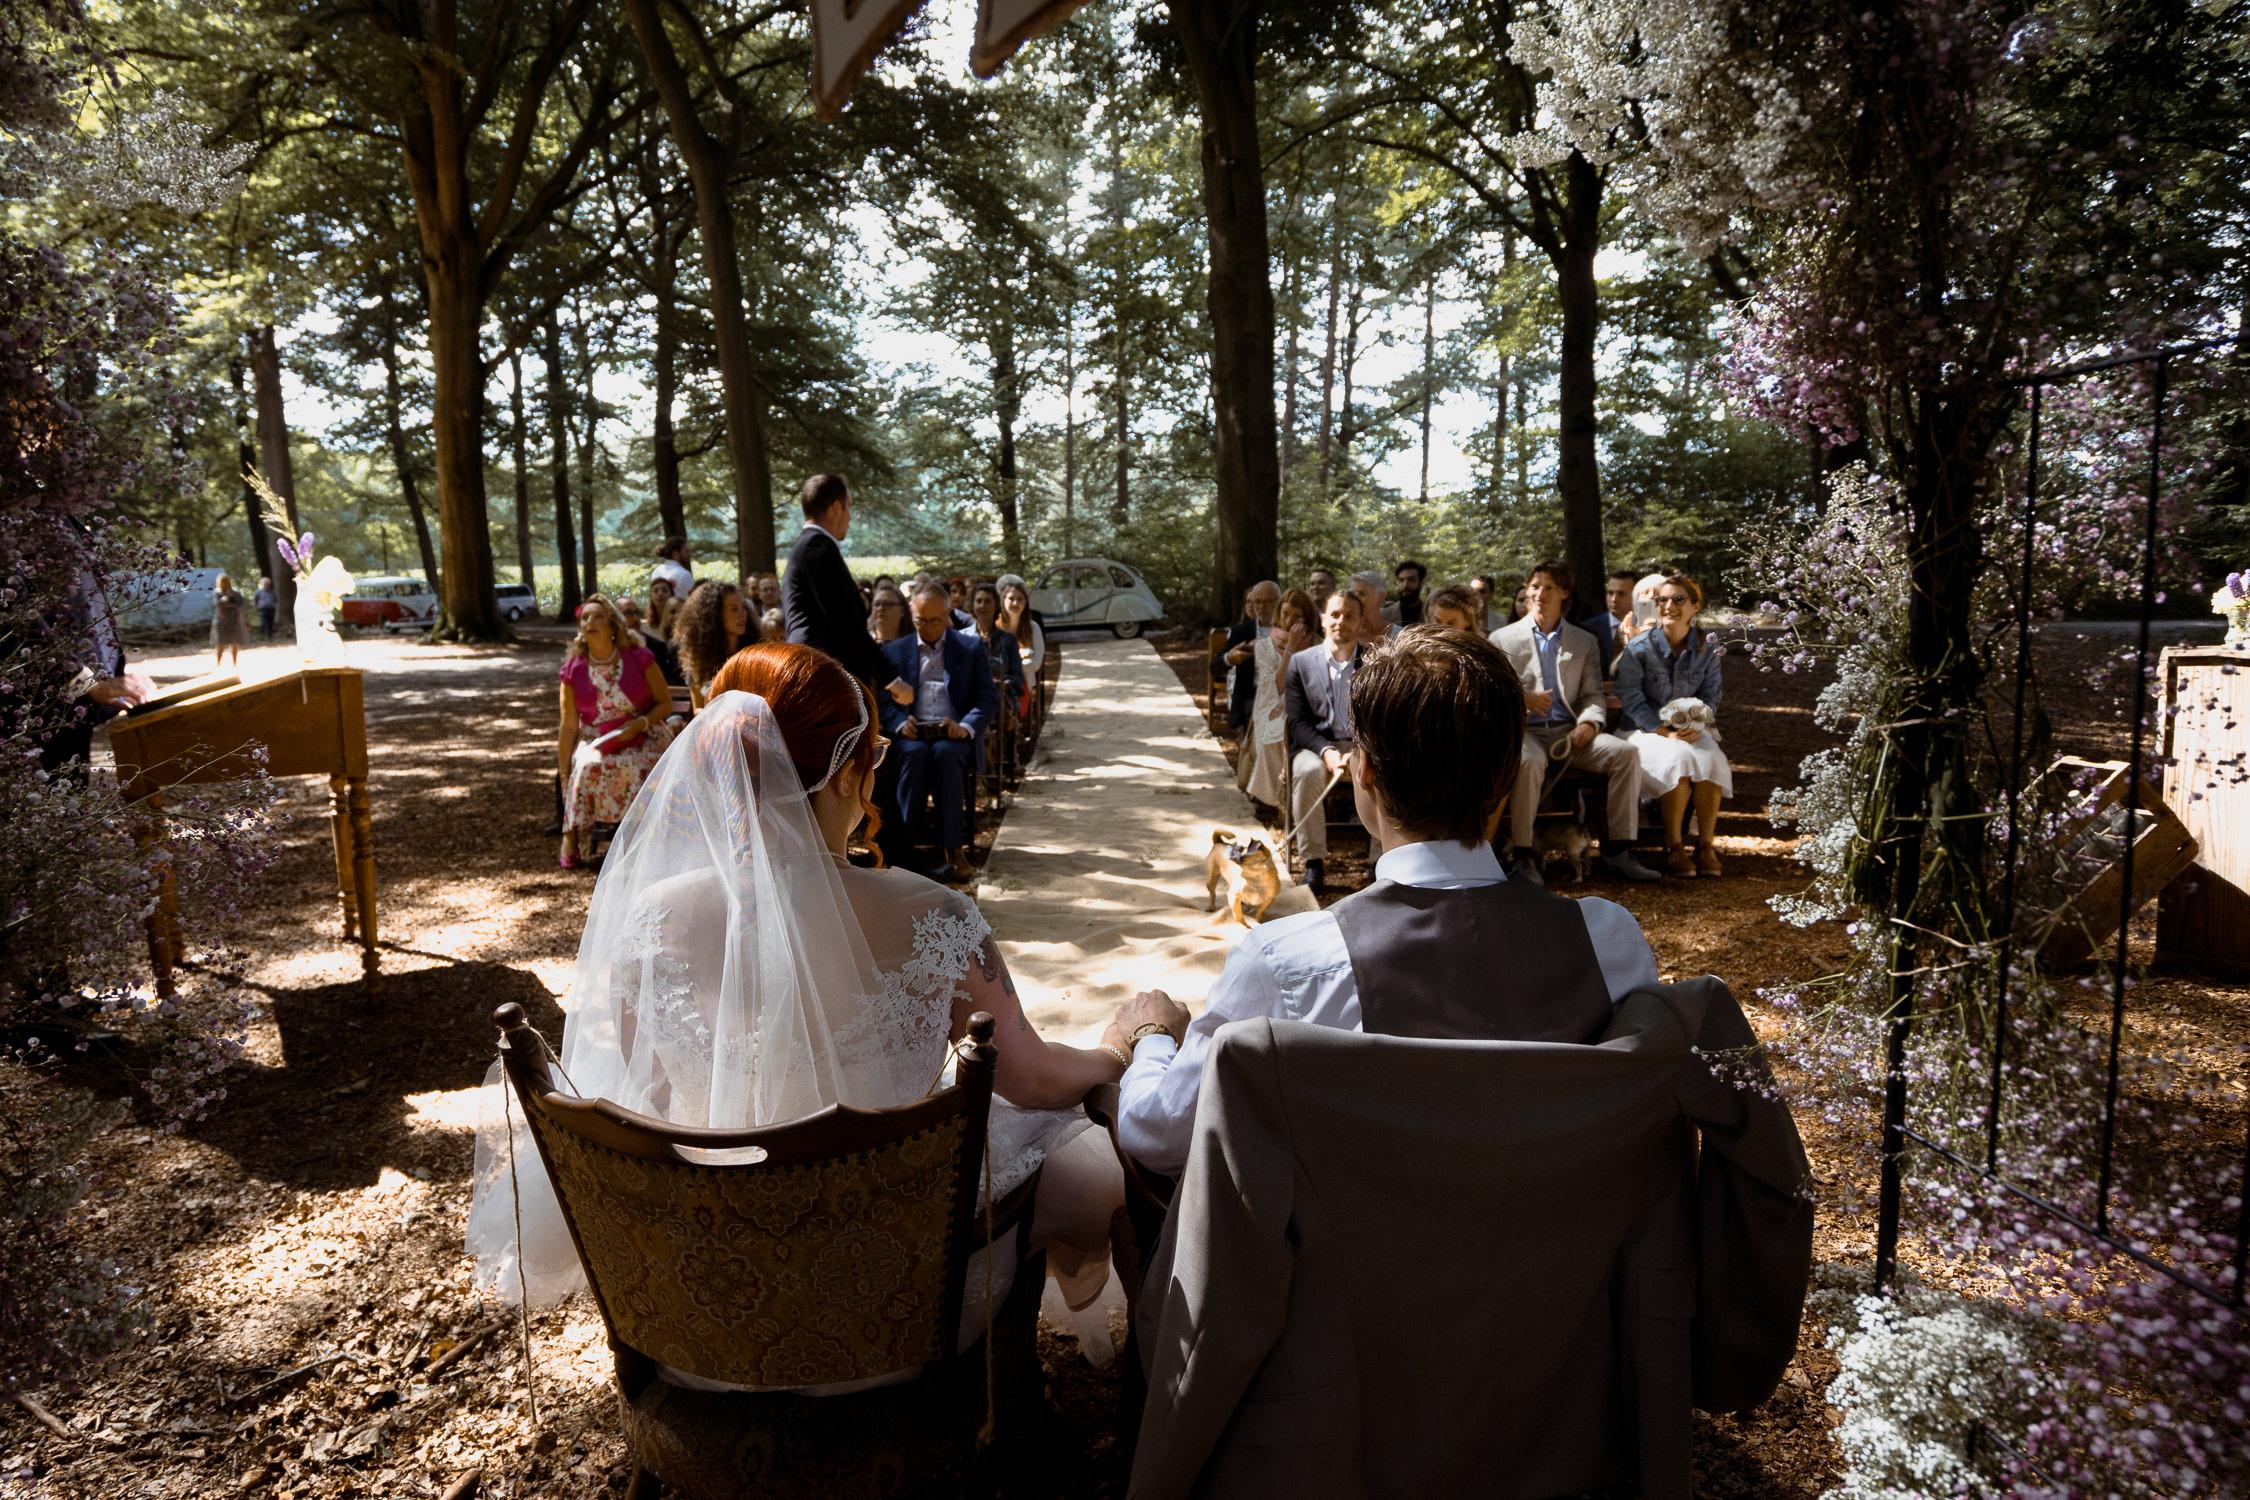 amsterdam-wedding-photographer-bruidsfotografie-trouwfotograaf-mark-hadden-Lucie-Luuk-091.jpg